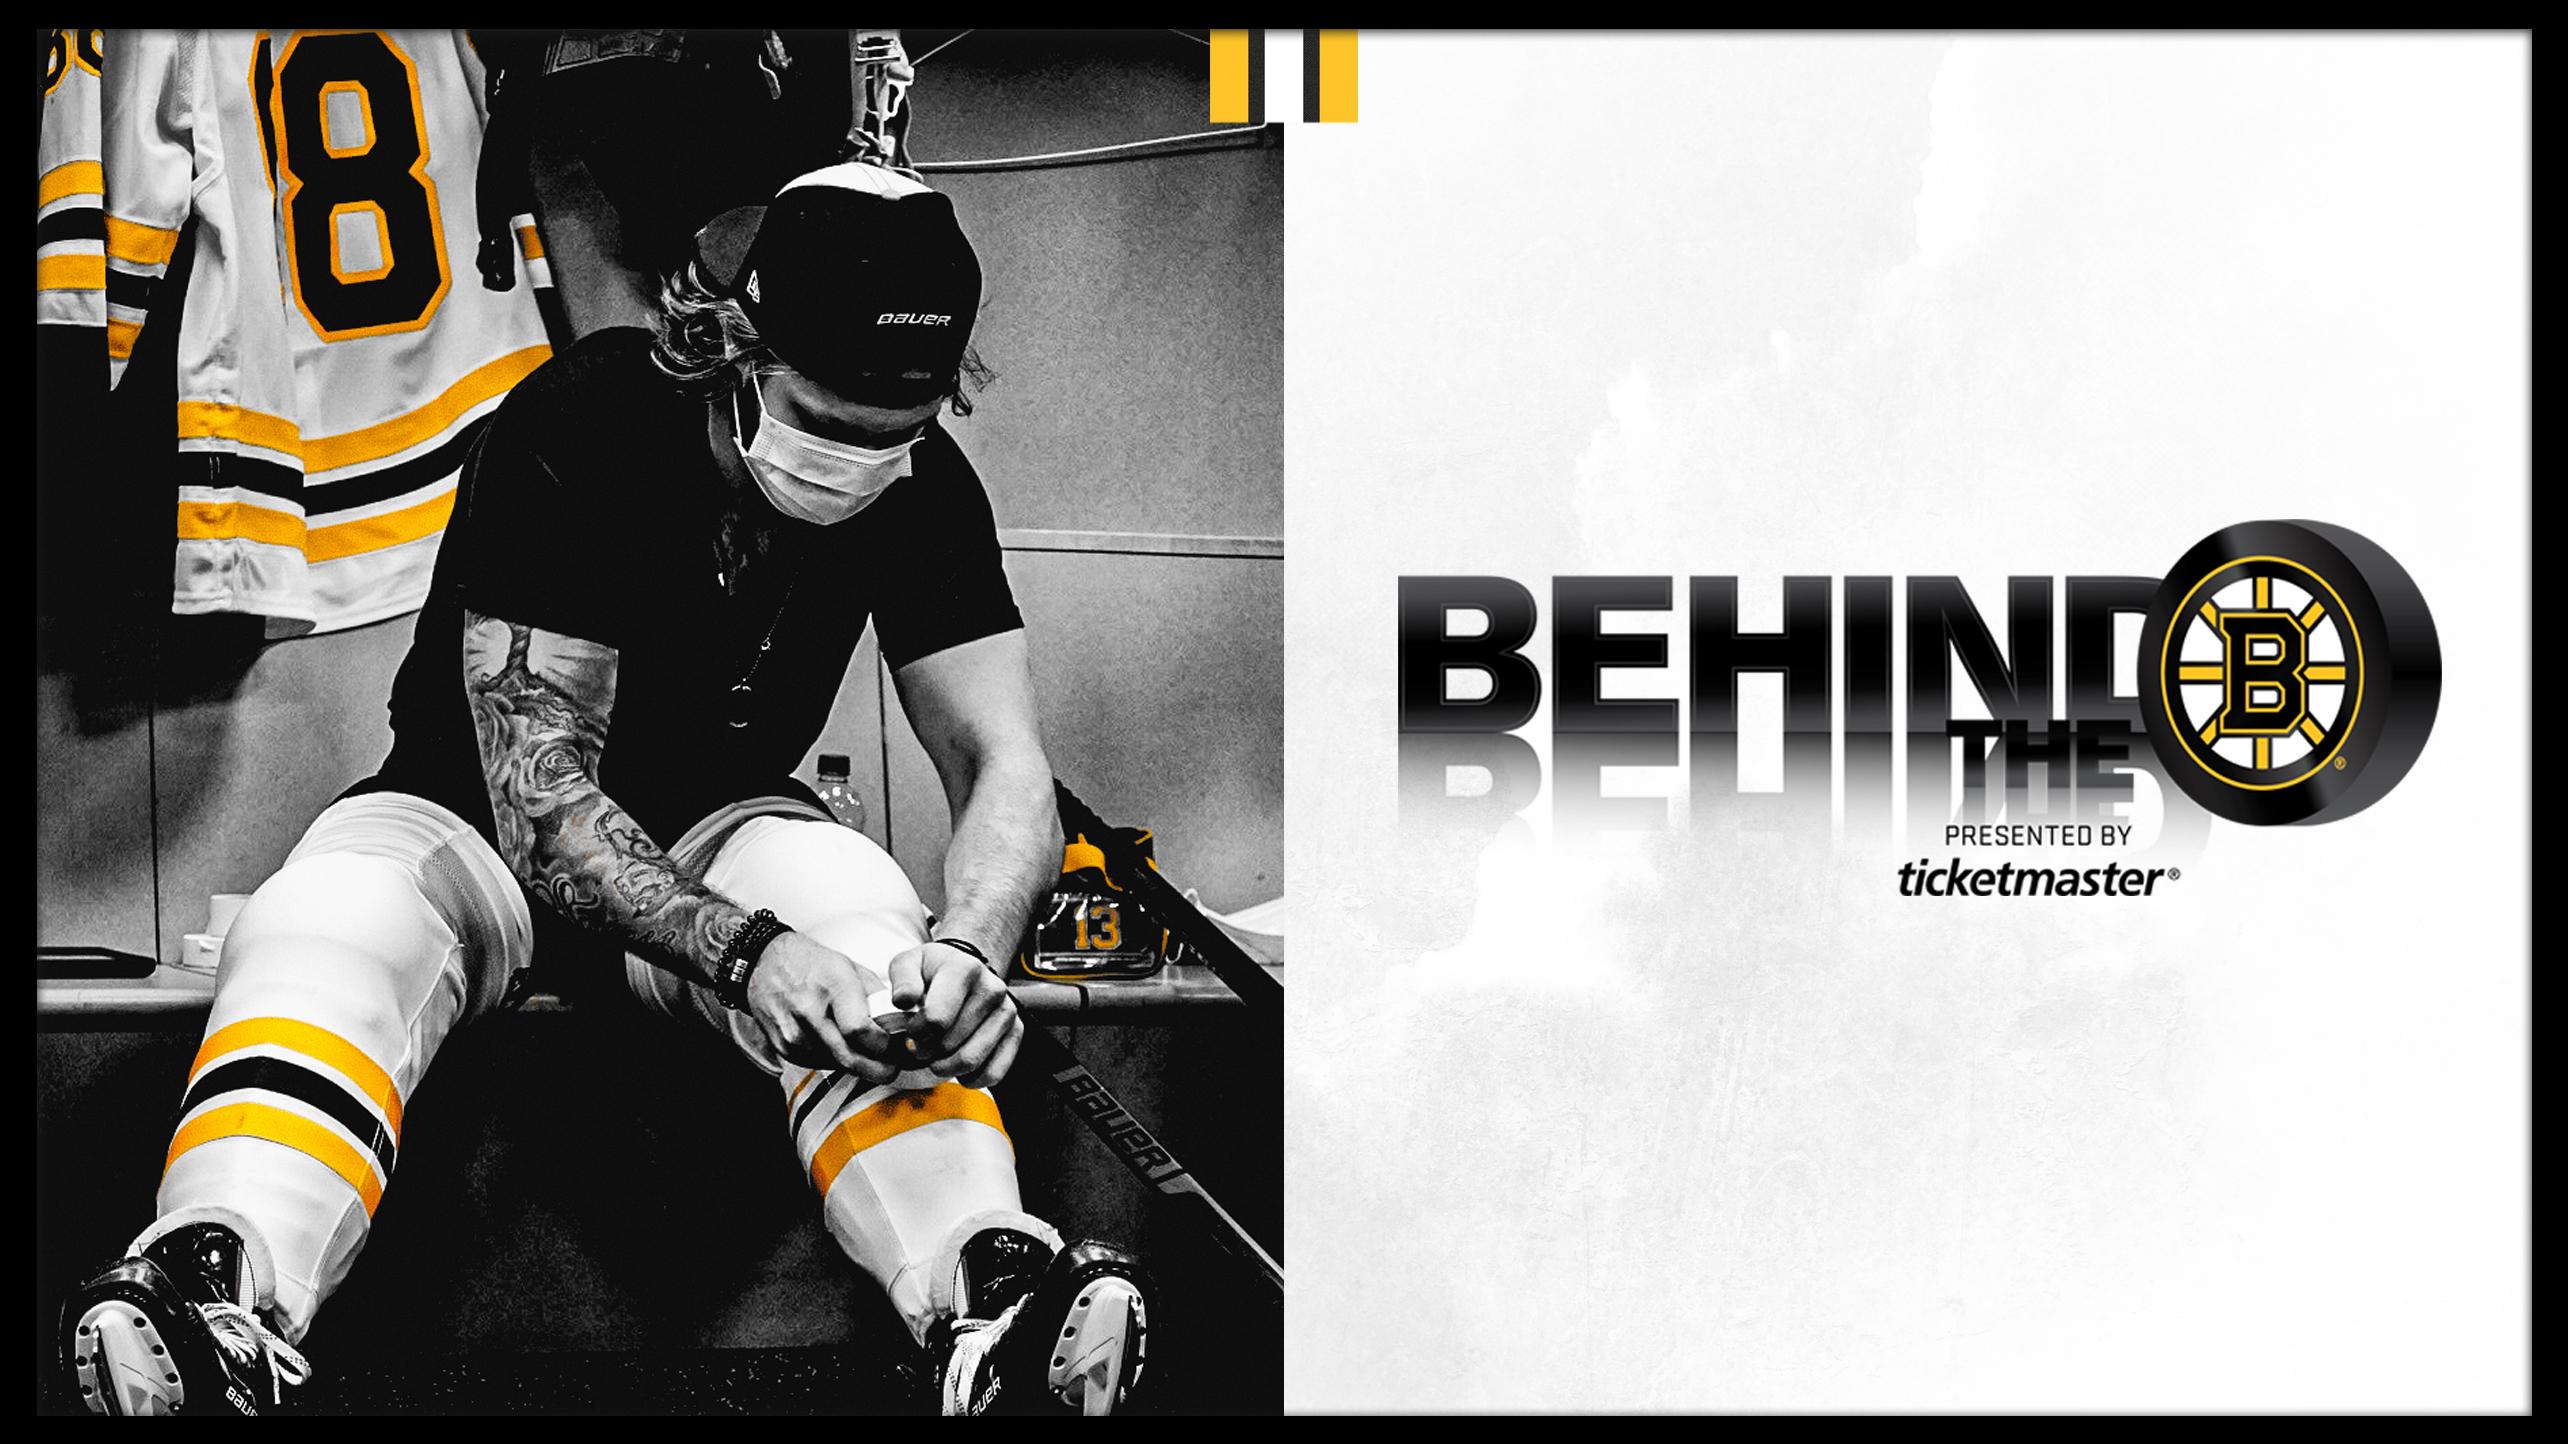 Behind the B: Season 8, Episode 2